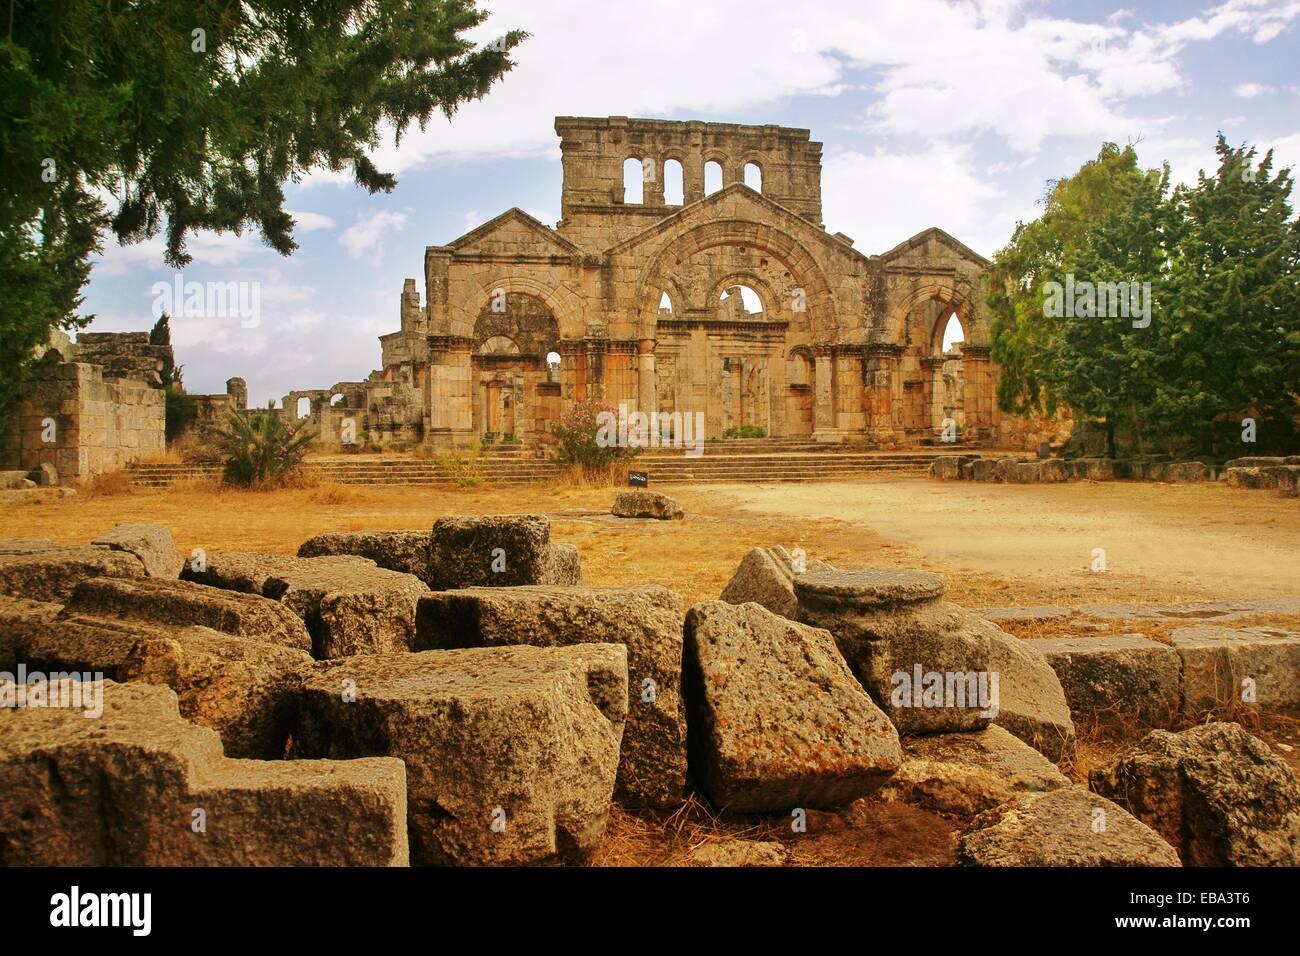 Basilica at the citadel of Saint Simeon the Stylite Qa´laat Samaan Syria - Stock Image